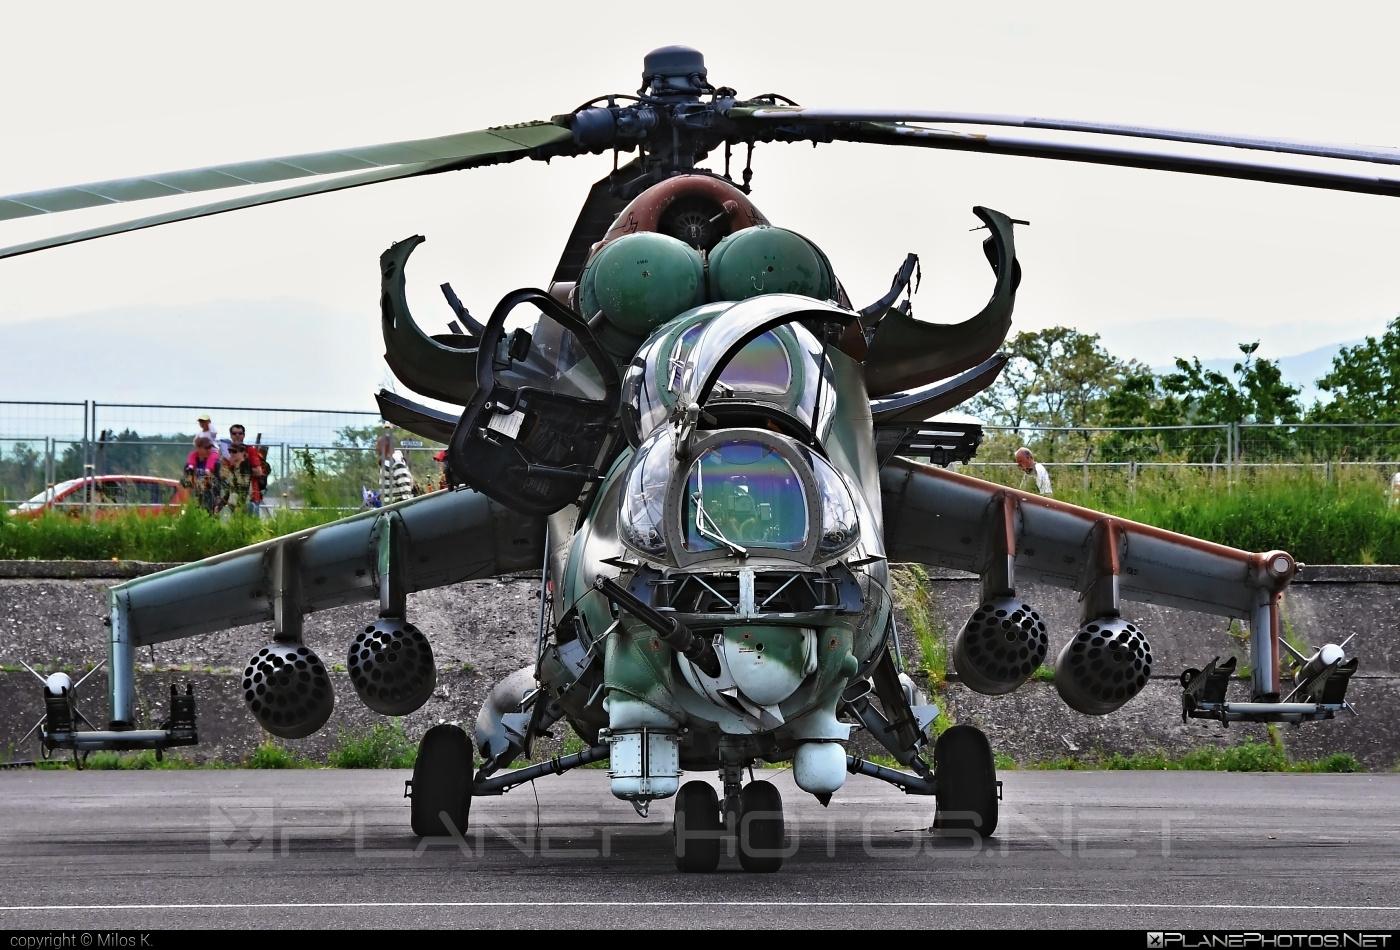 Mil Mi-24D - 0100 operated by Vzdušné sily OS SR (Slovak Air Force) #mi24 #mi24d #mil #mil24 #mil24d #milhelicopters #slovakairforce #vzdusnesilyossr